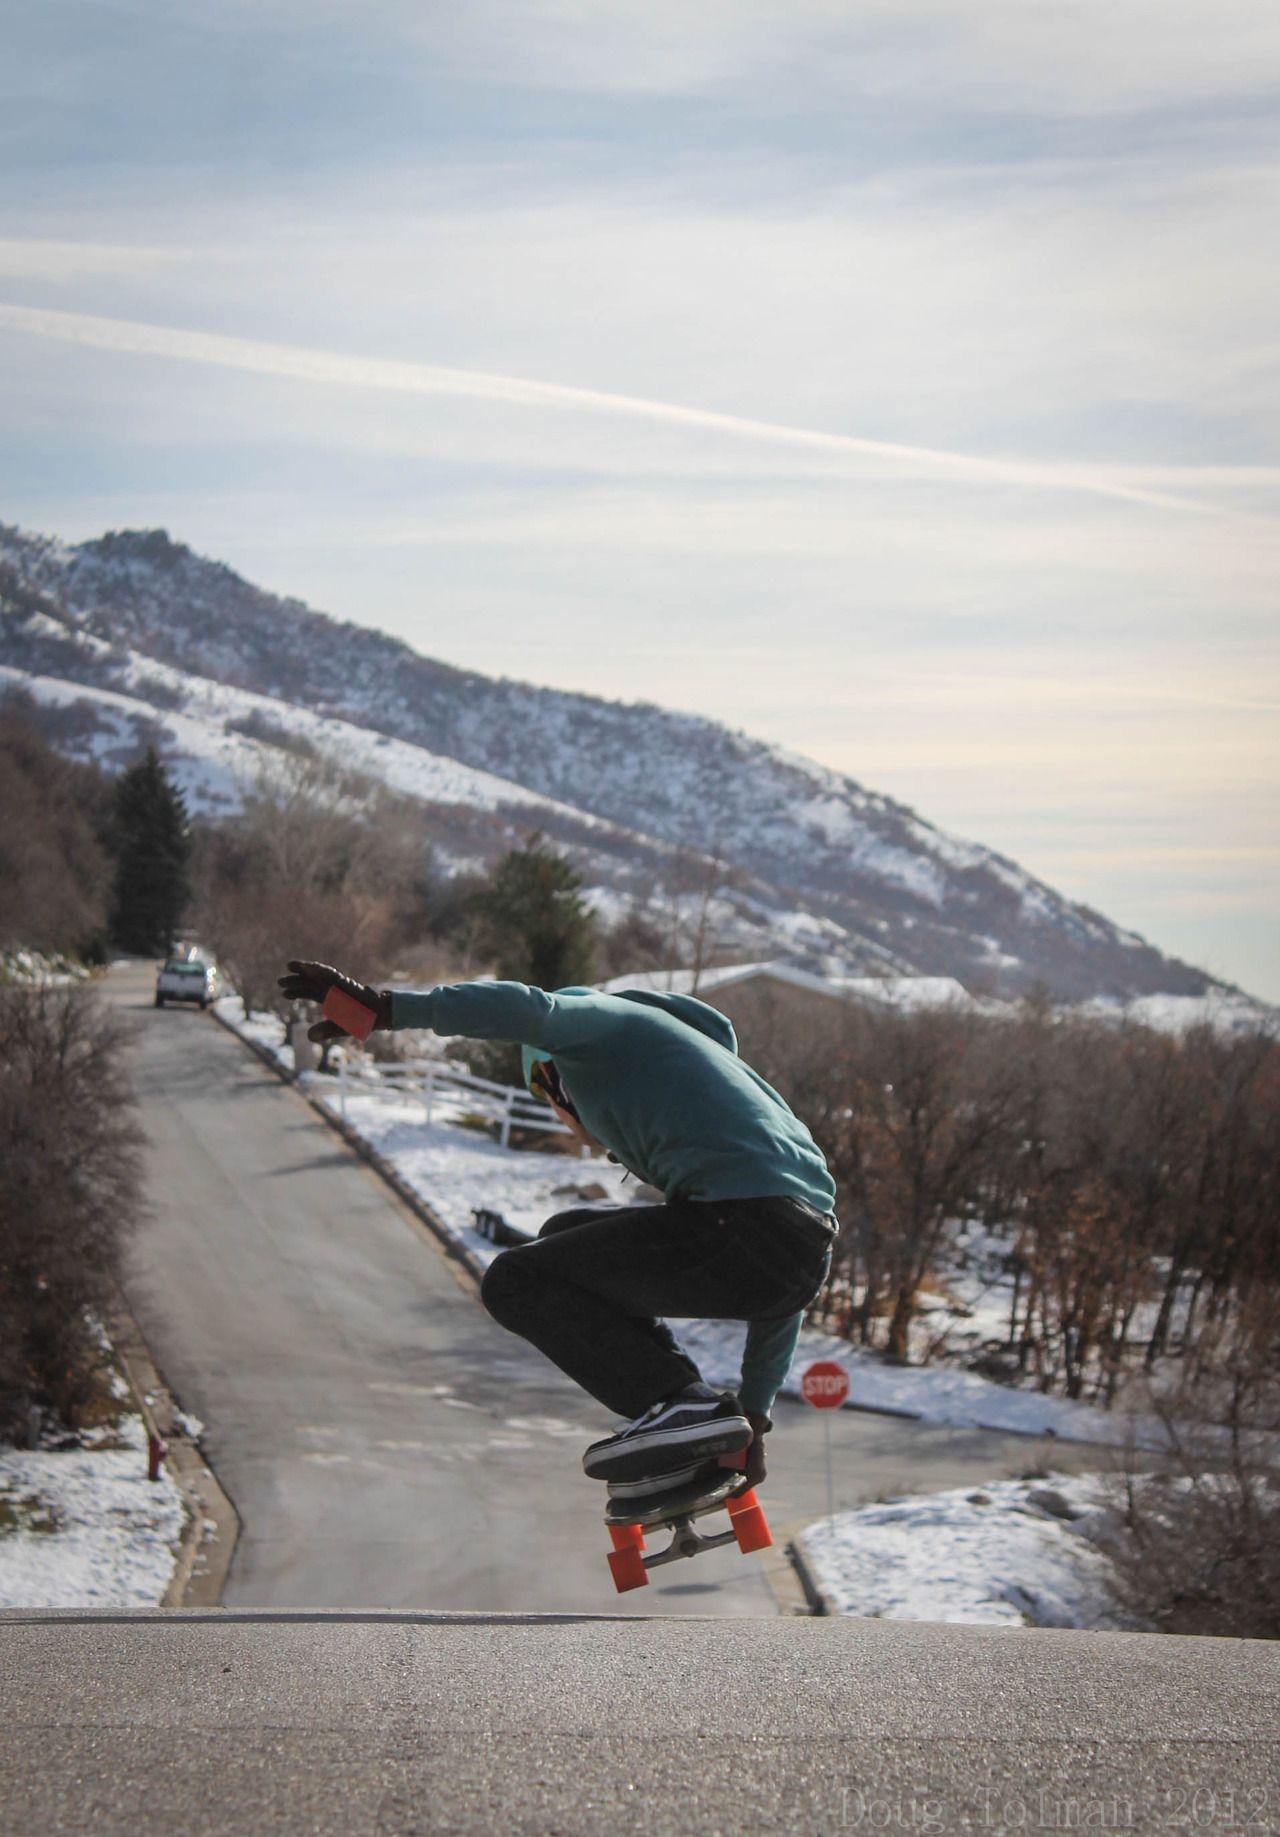 Pin on Skate 4 Life